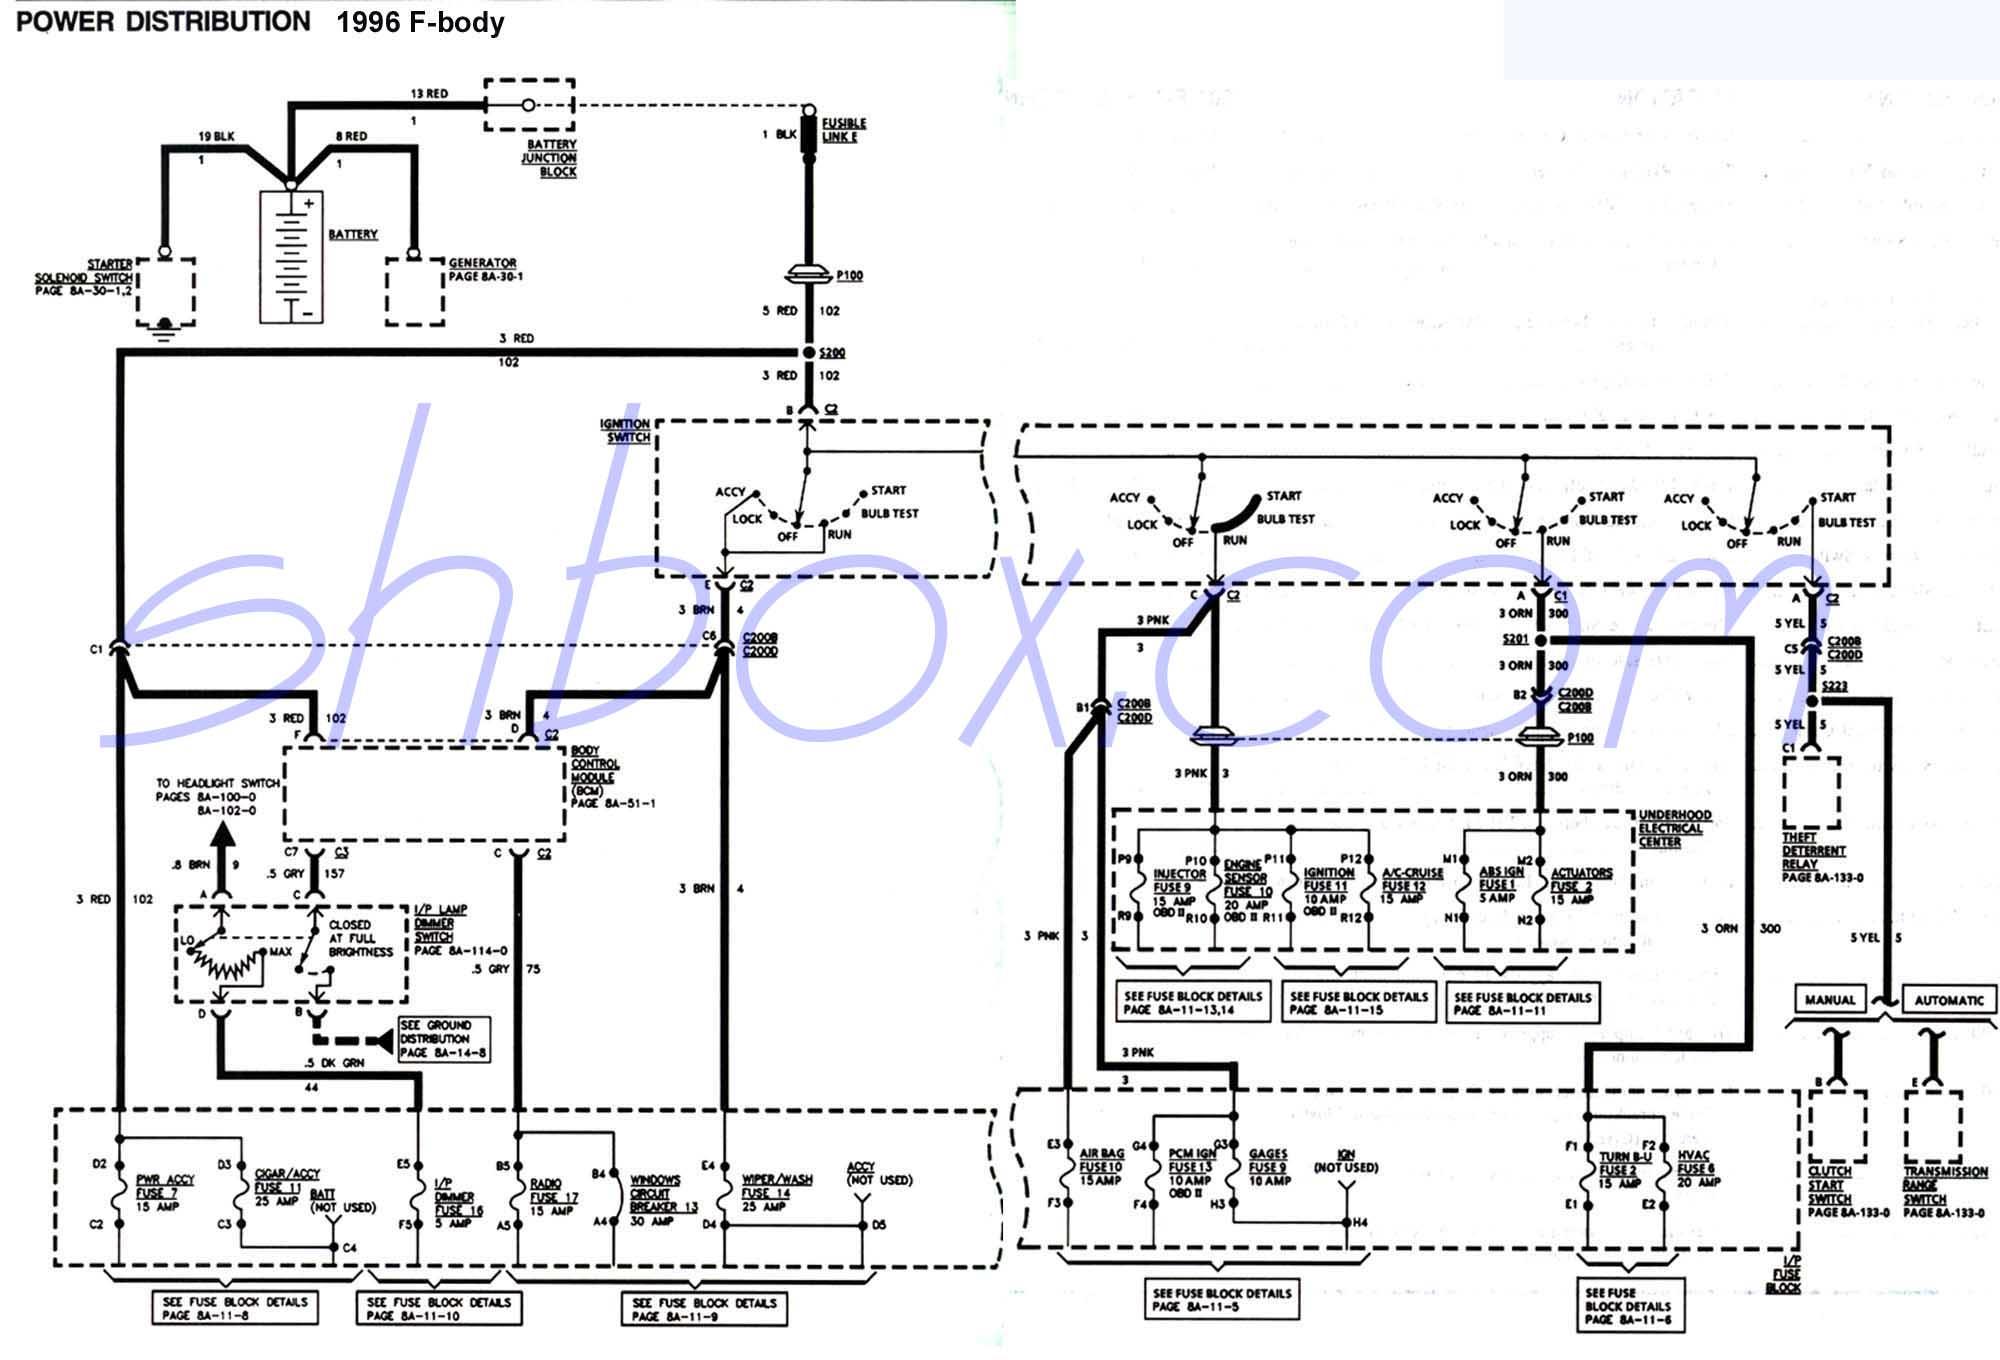 4Th Gen Lt1 F-Body Tech Aids - Hei Conversion Wiring Diagram